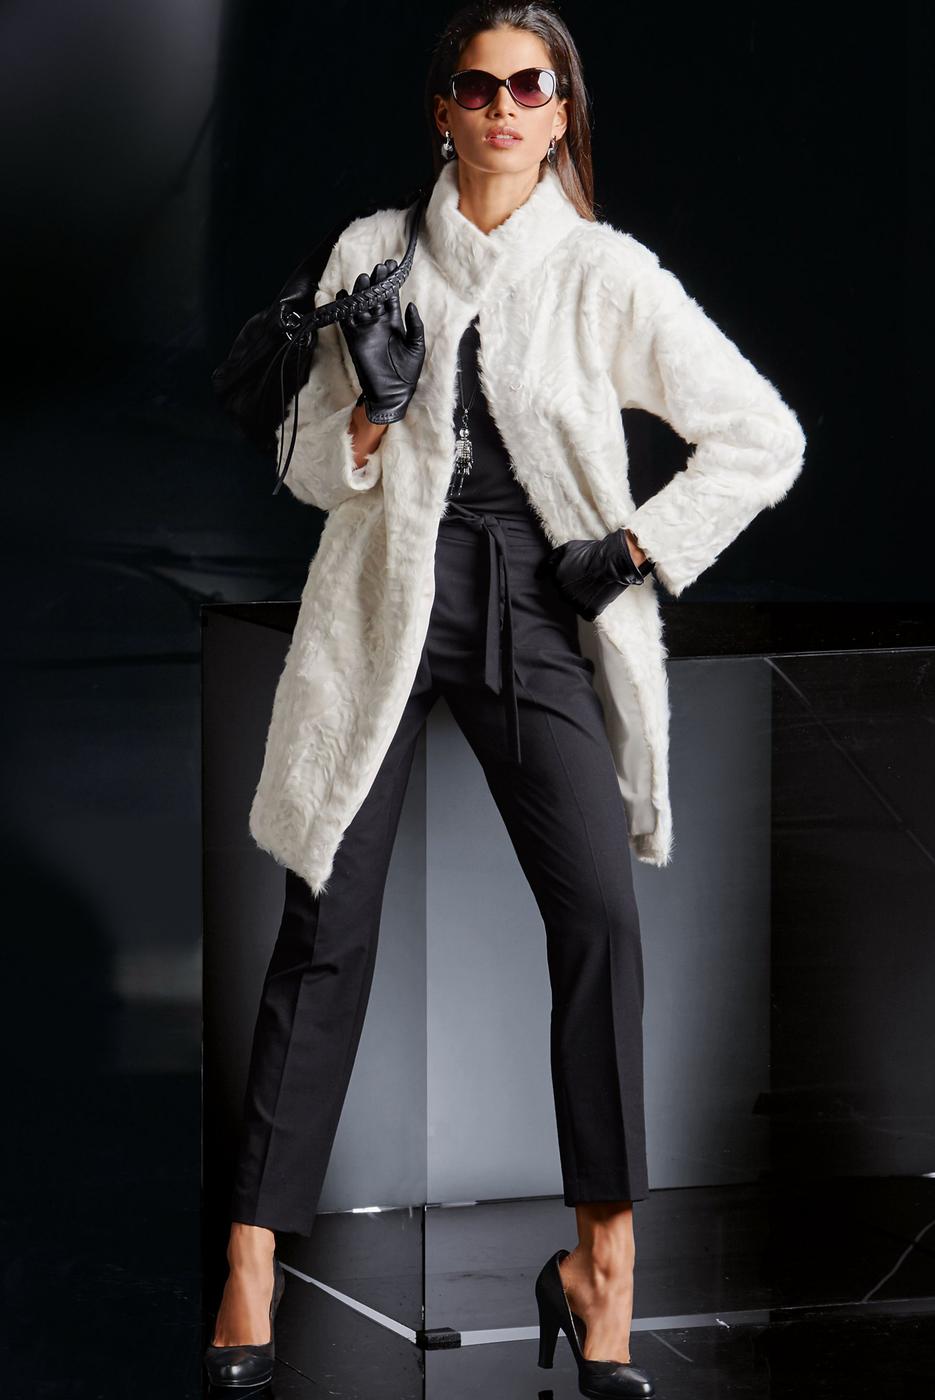 Madeleine Lambskin Jacket in Wool White